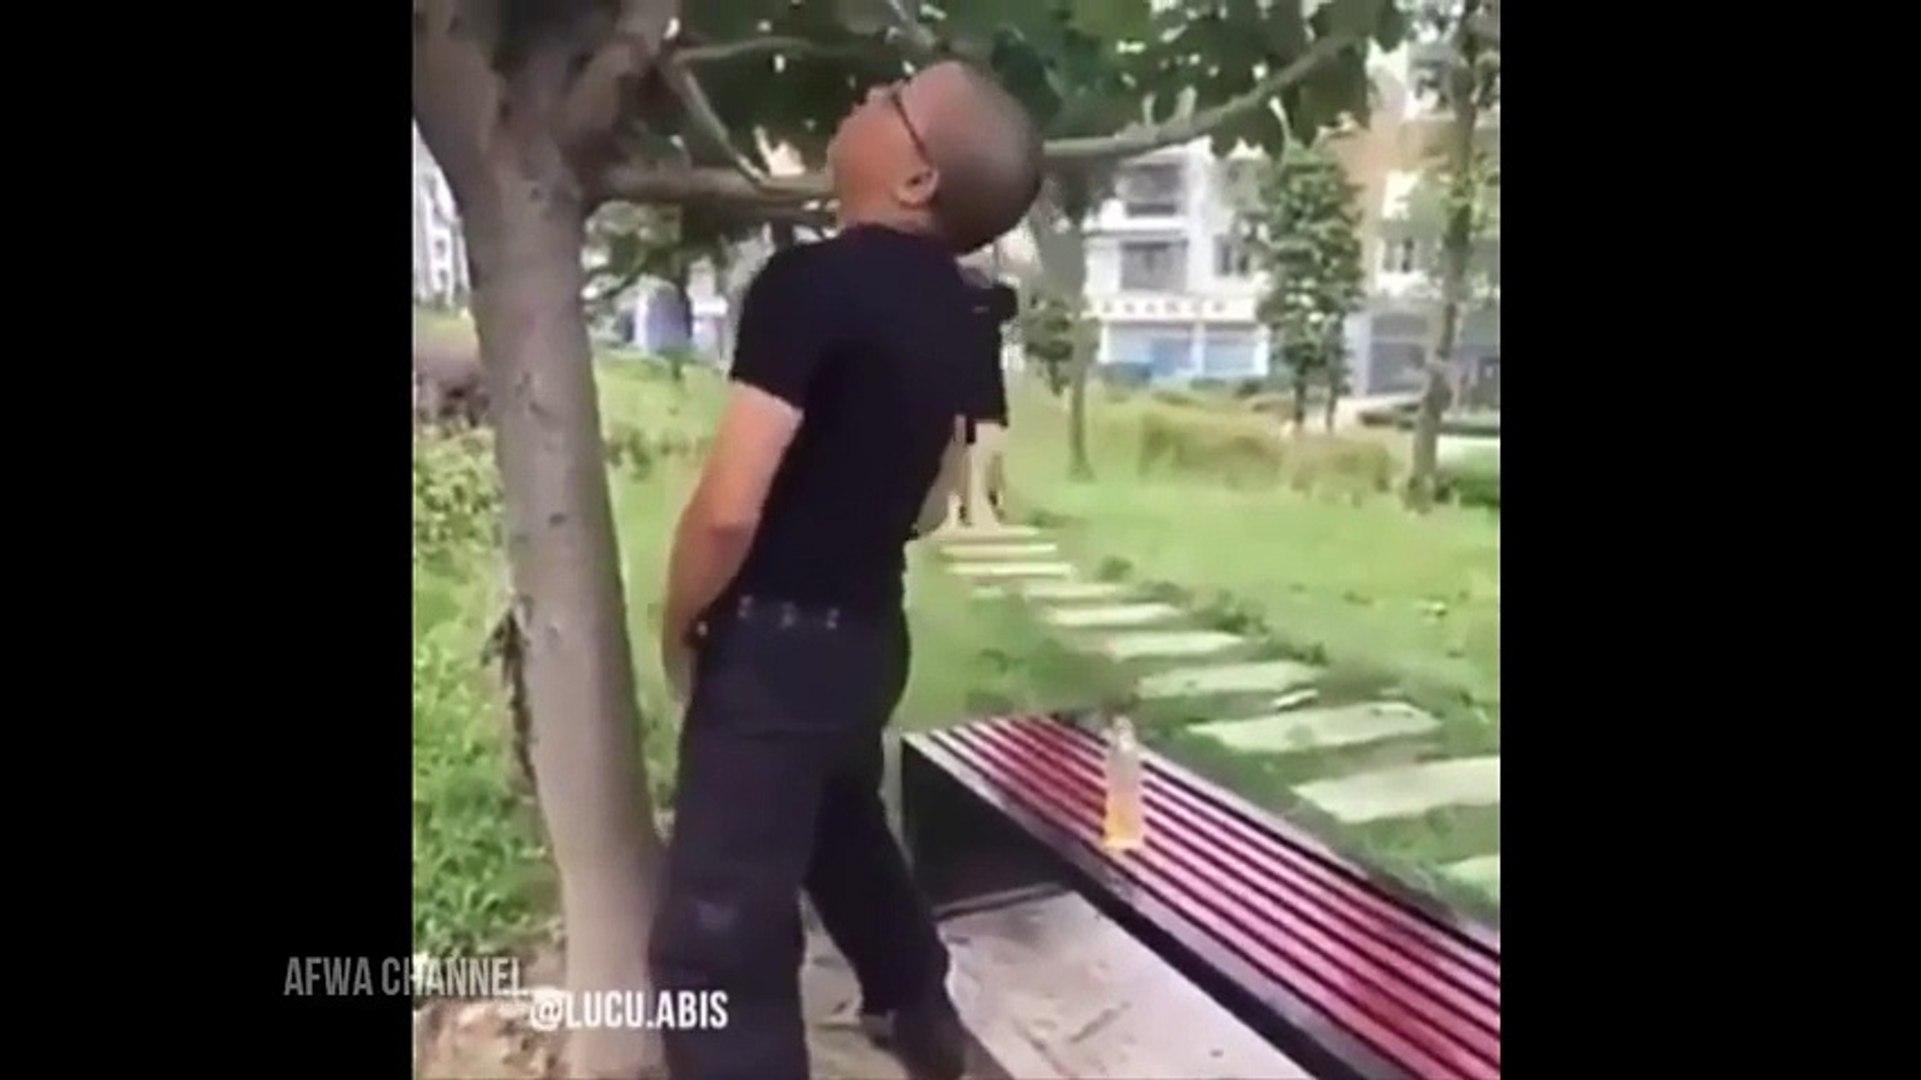 Bodoh Apa Lucu Hahaha Lucu Ban Part 2 Video